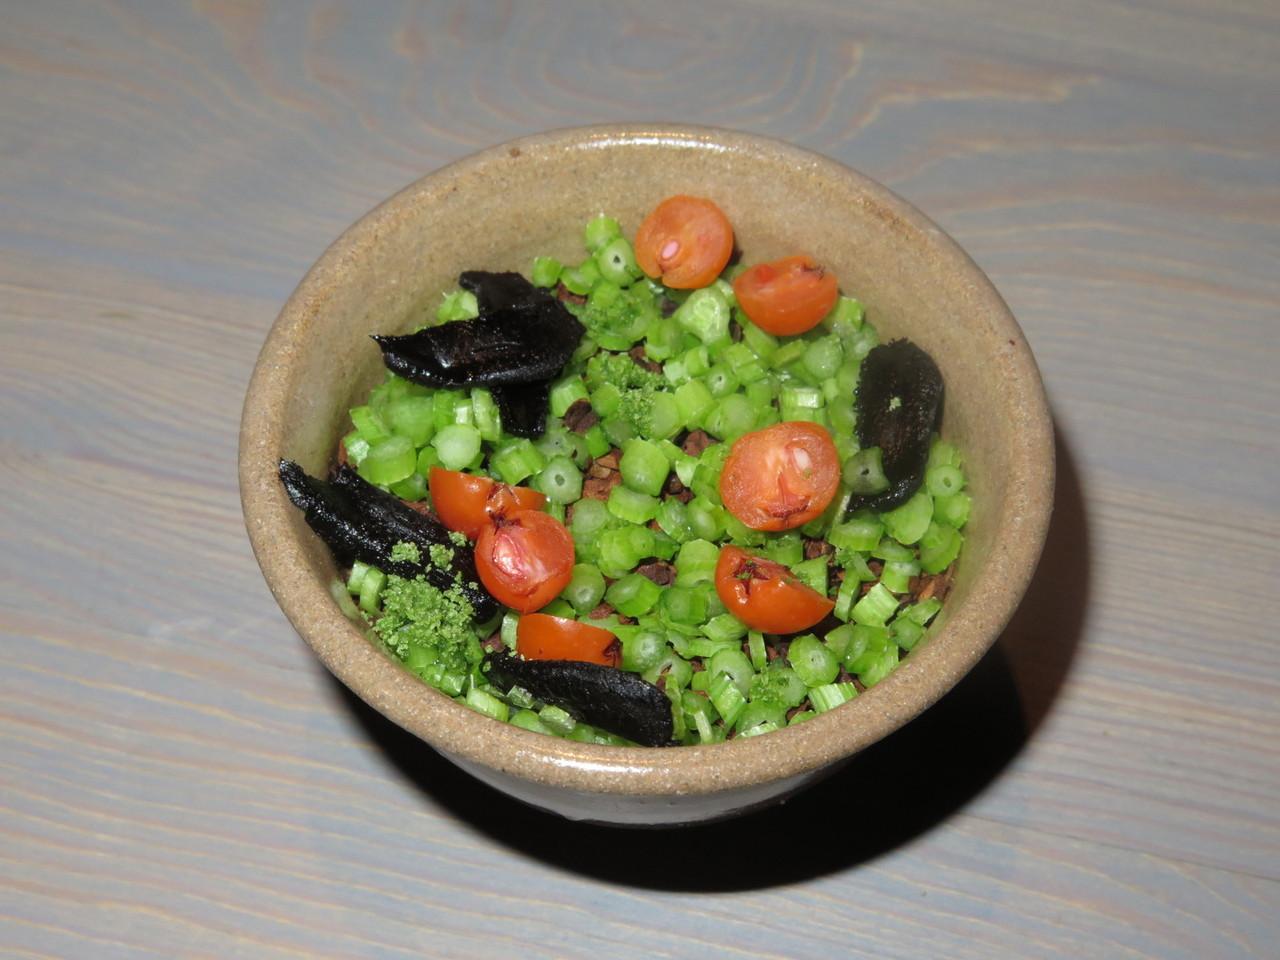 Bird's liver custard, malted cabbage, rowan berries and parsley stems